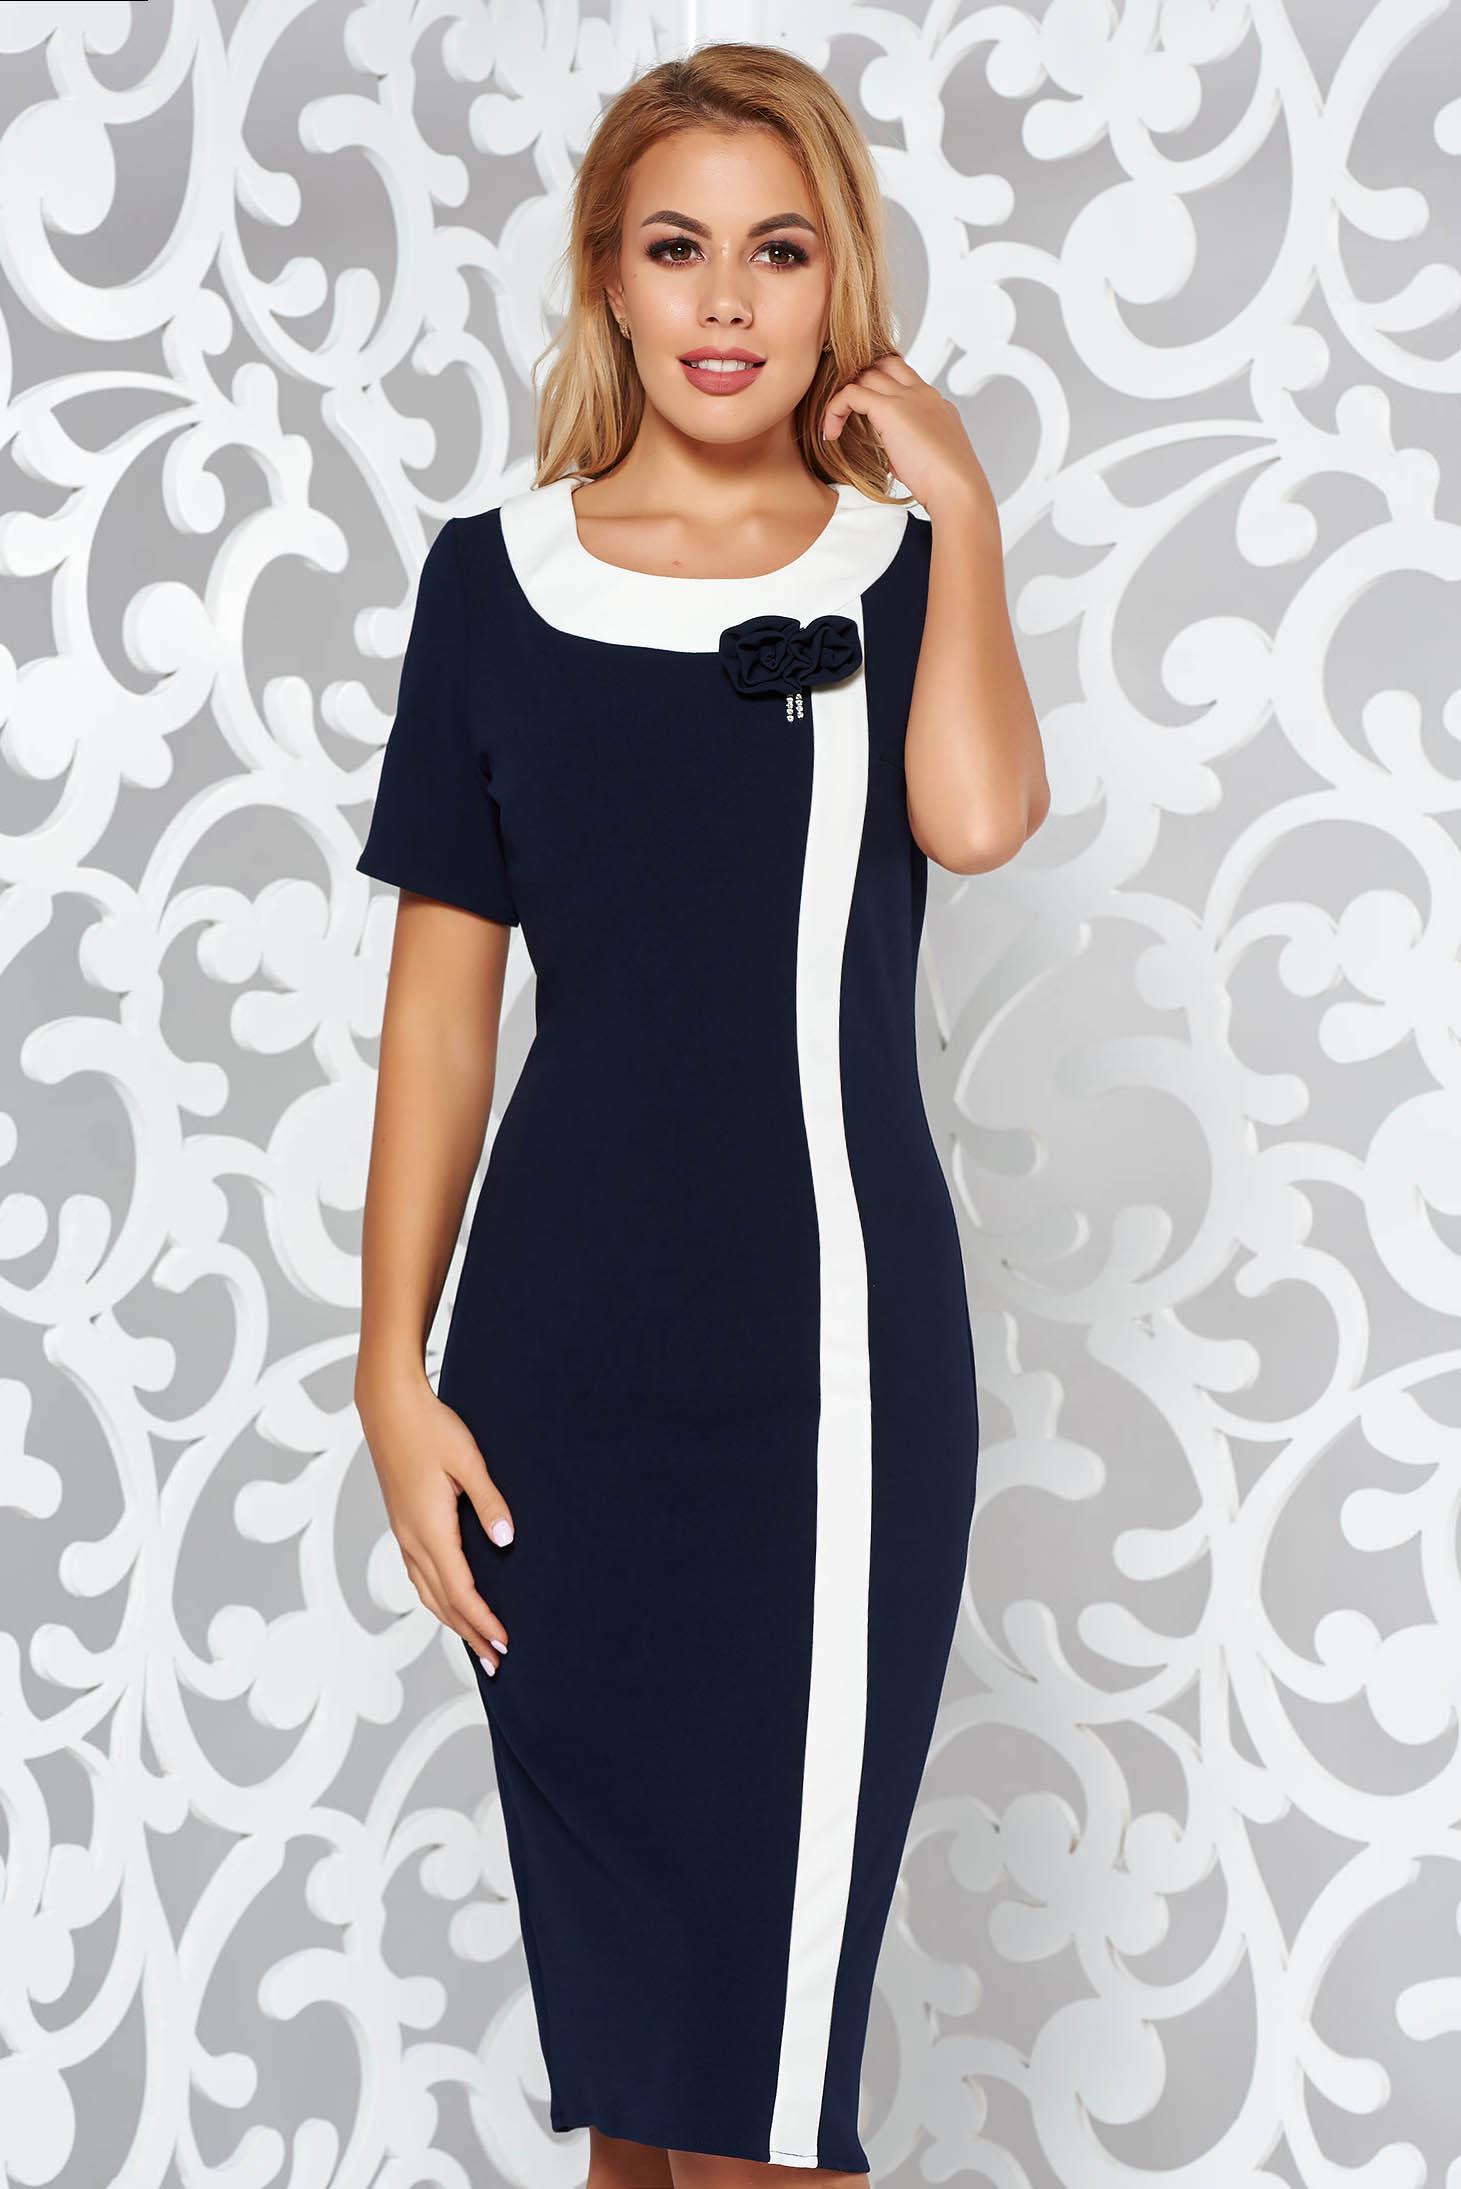 e6fefdfb0f03 darkblue-elegant-midi-pencil-dress-from-elastic-fa-S038565-2-378654.jpg